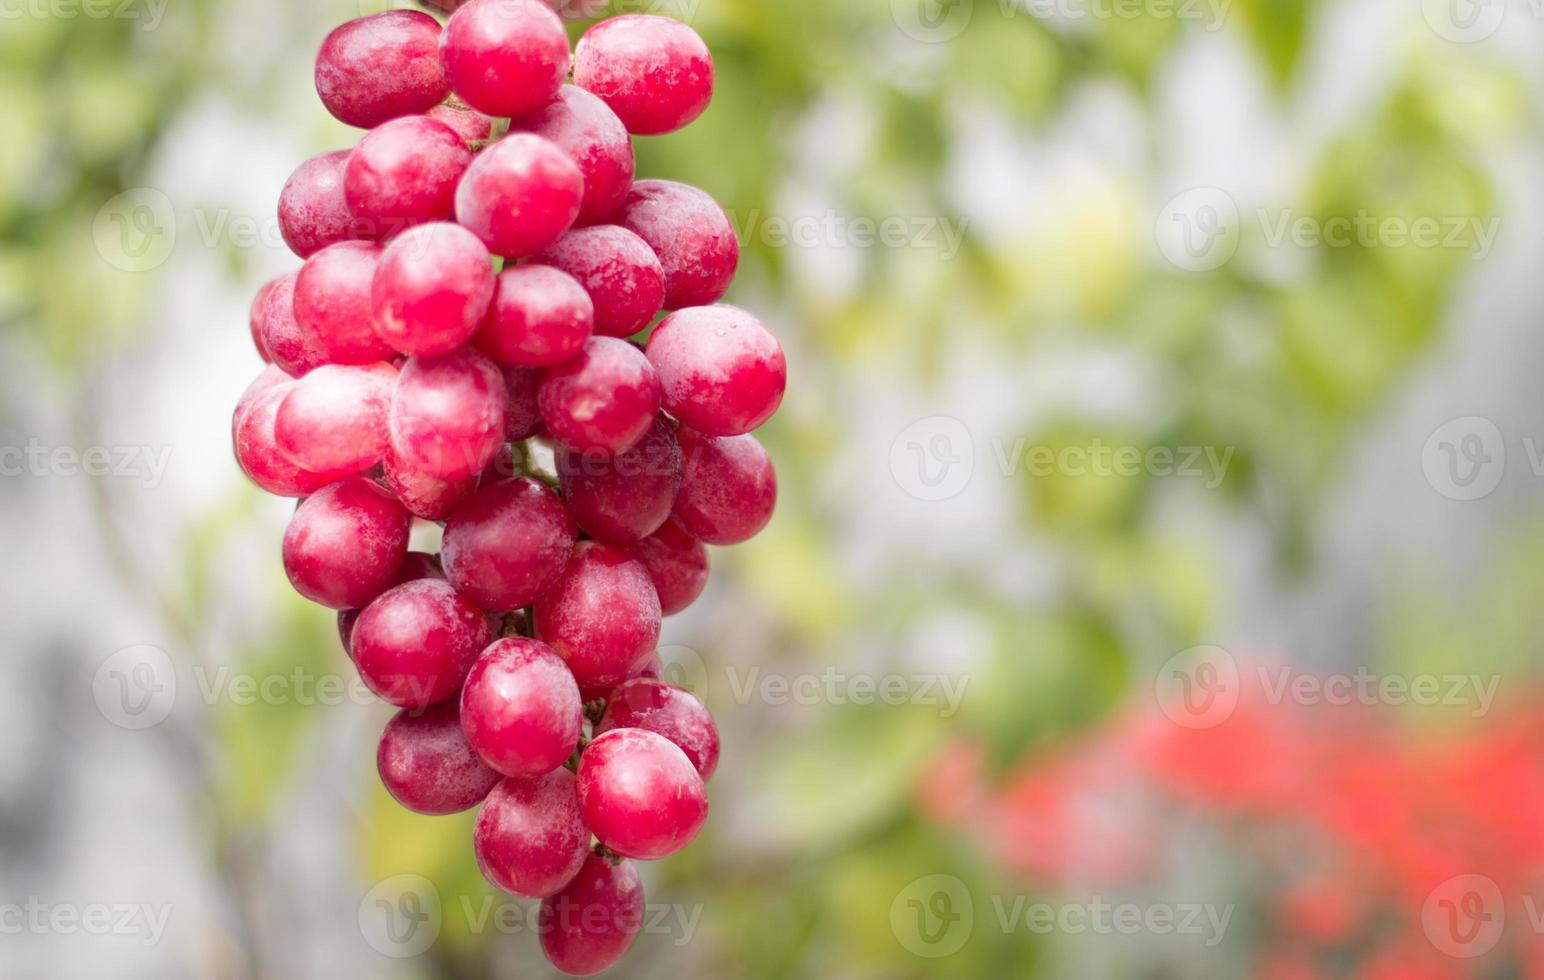 druvor som hänger i träden foto